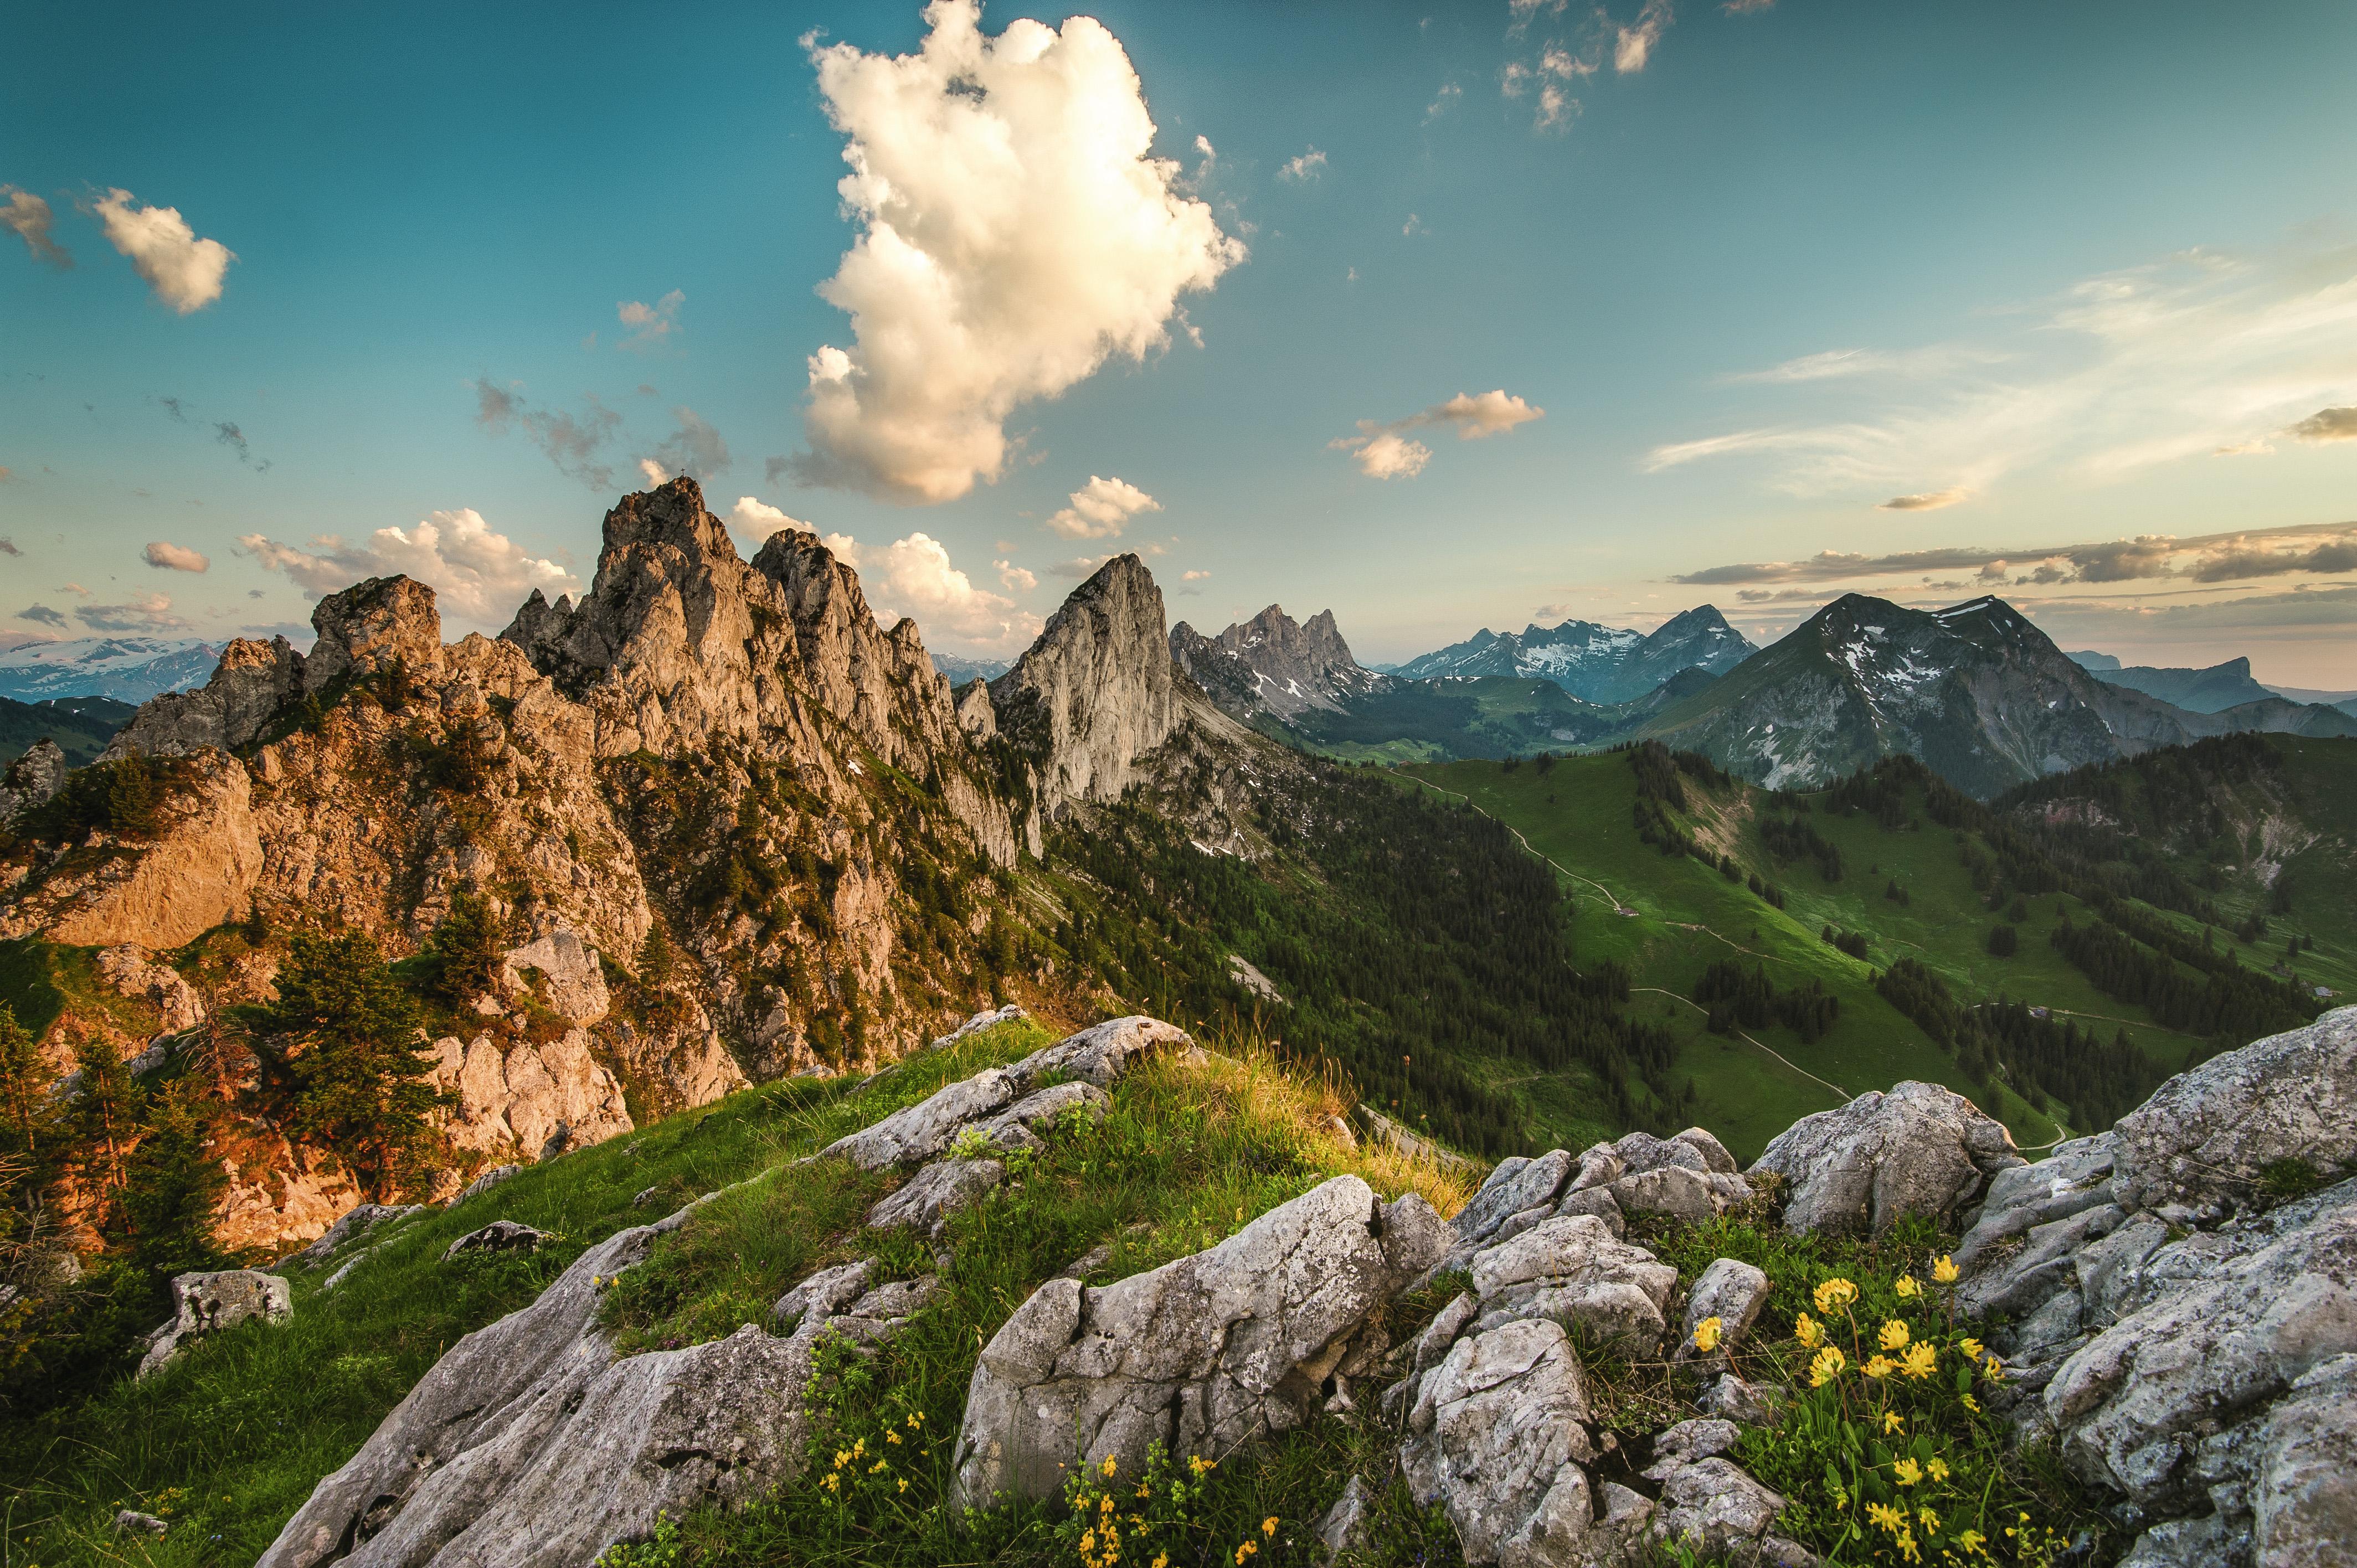 Balade panoramique en Suisse romande - Tour des Gastlosen (Jaun)